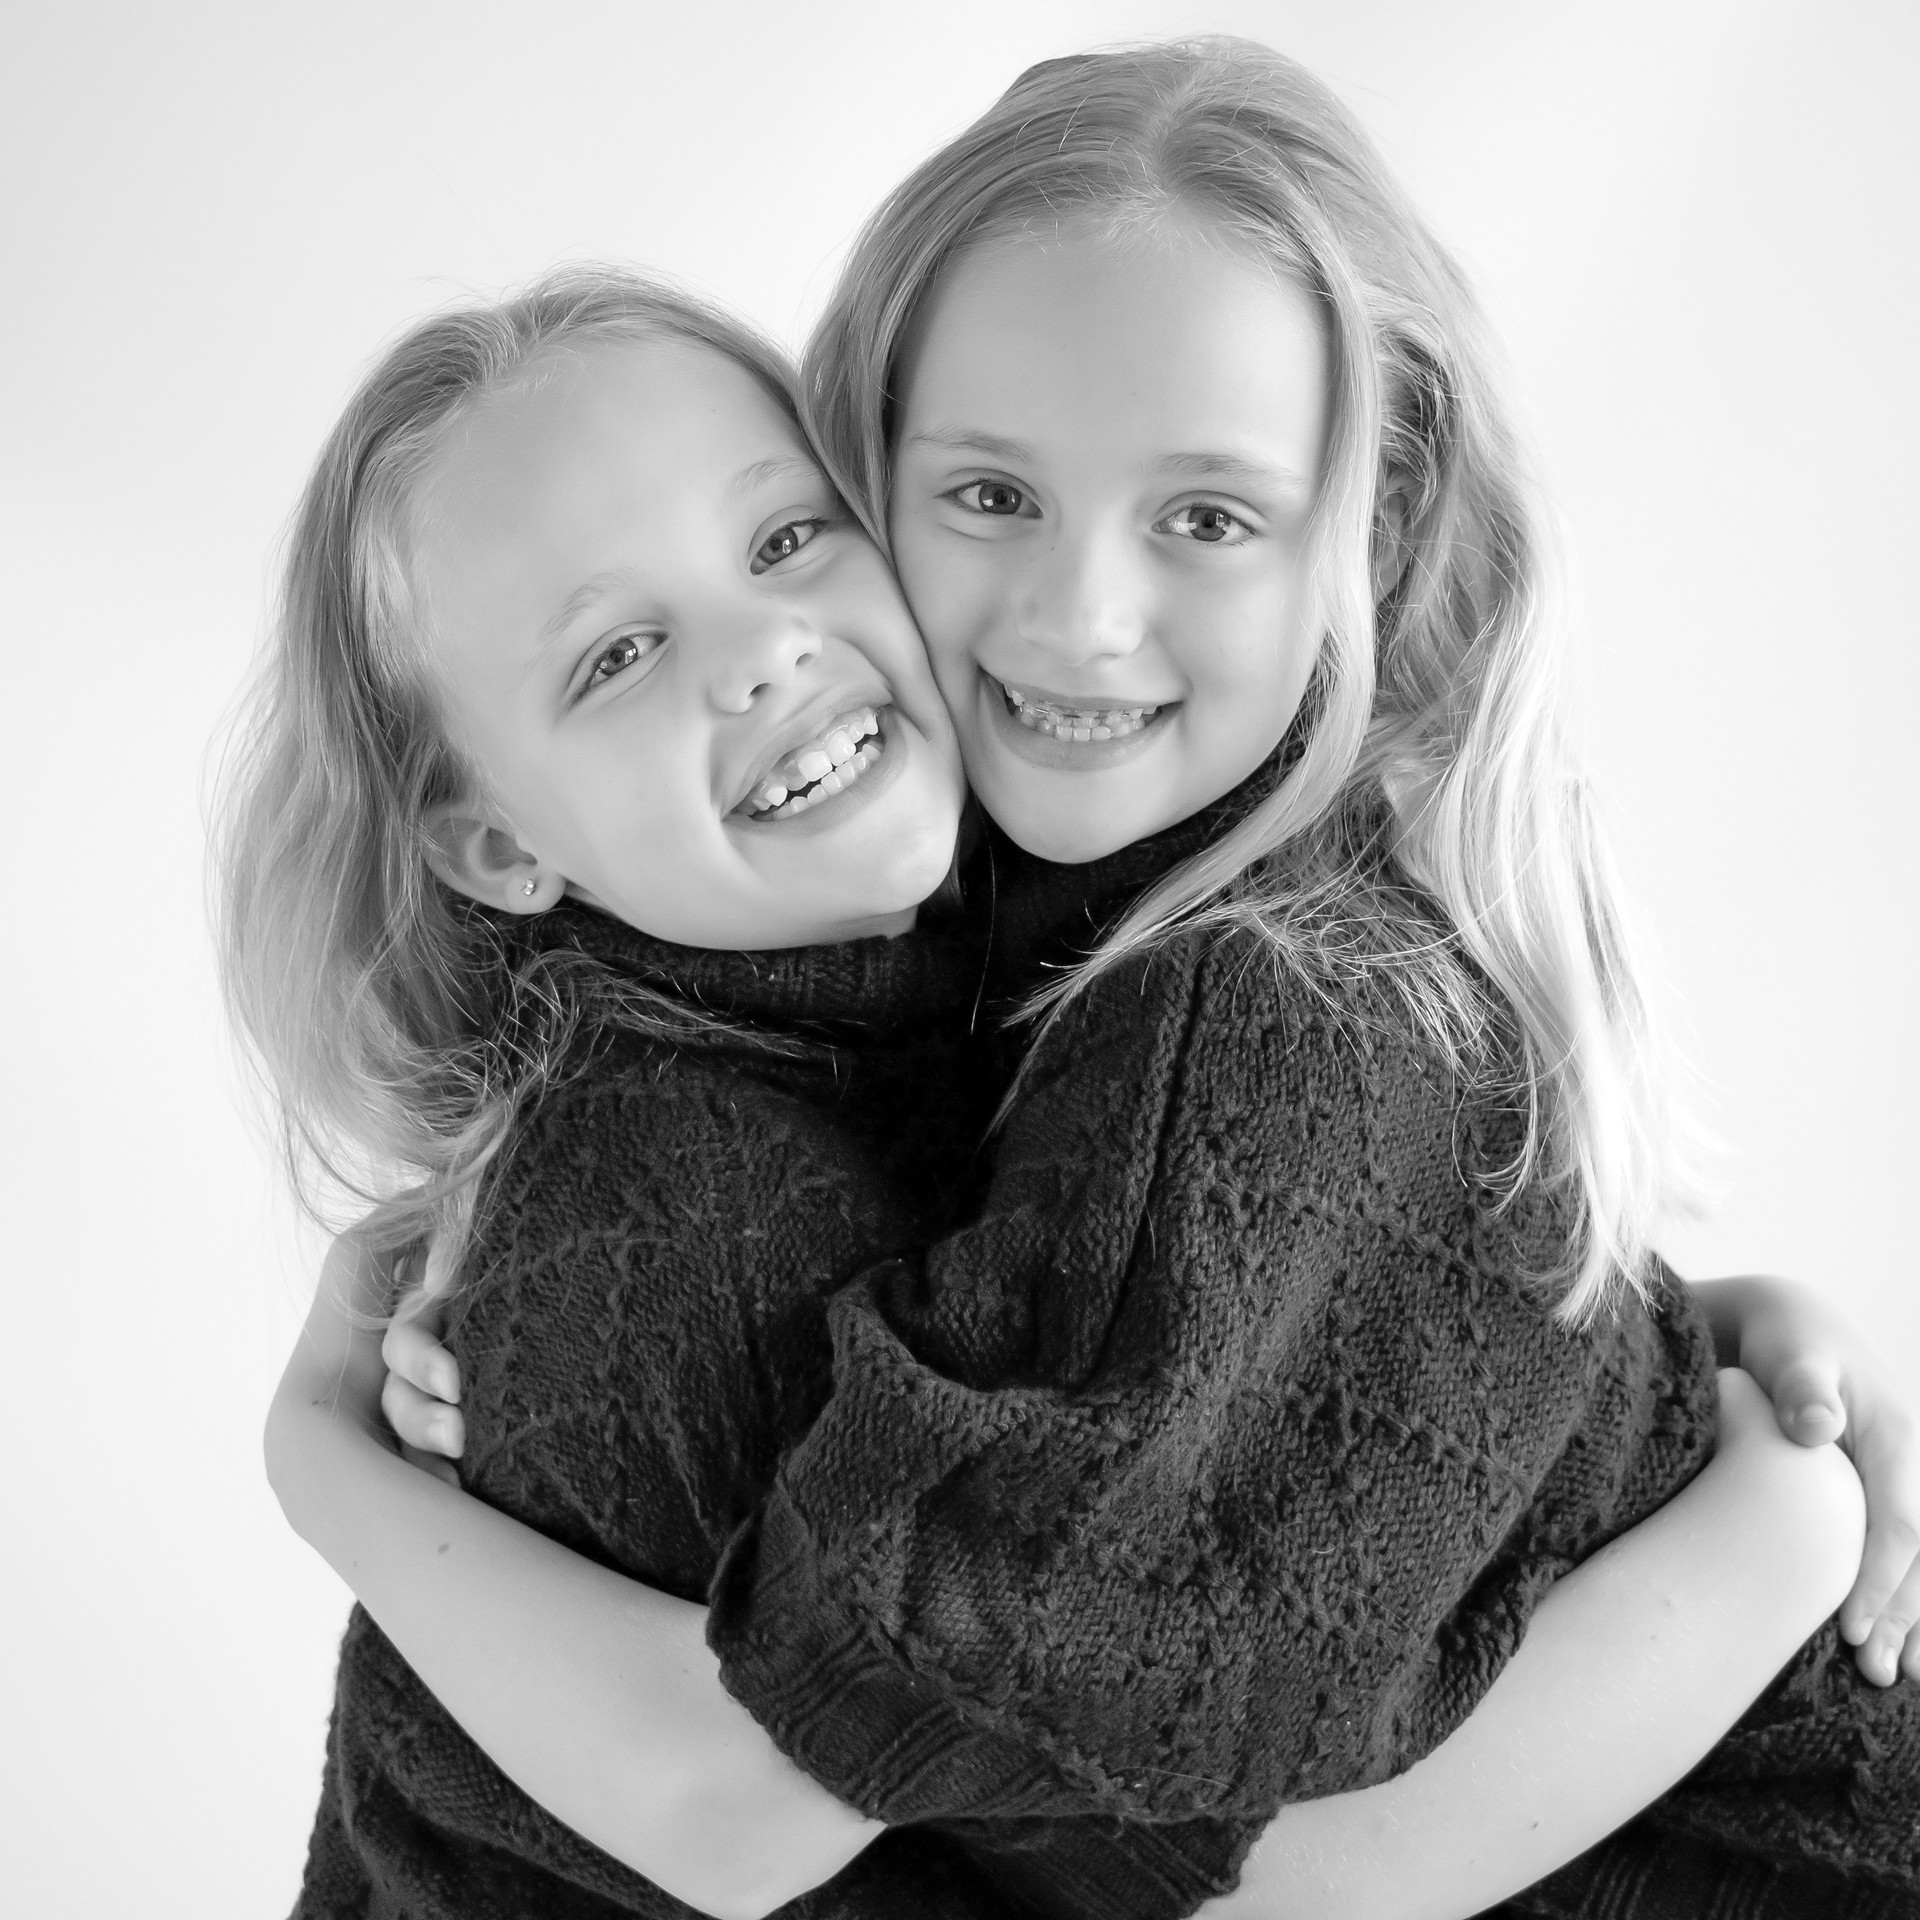 Girls Pic2. Creative Children and baby Photography Studio shoot, Dream Alice Photography & Art, Gold Coast